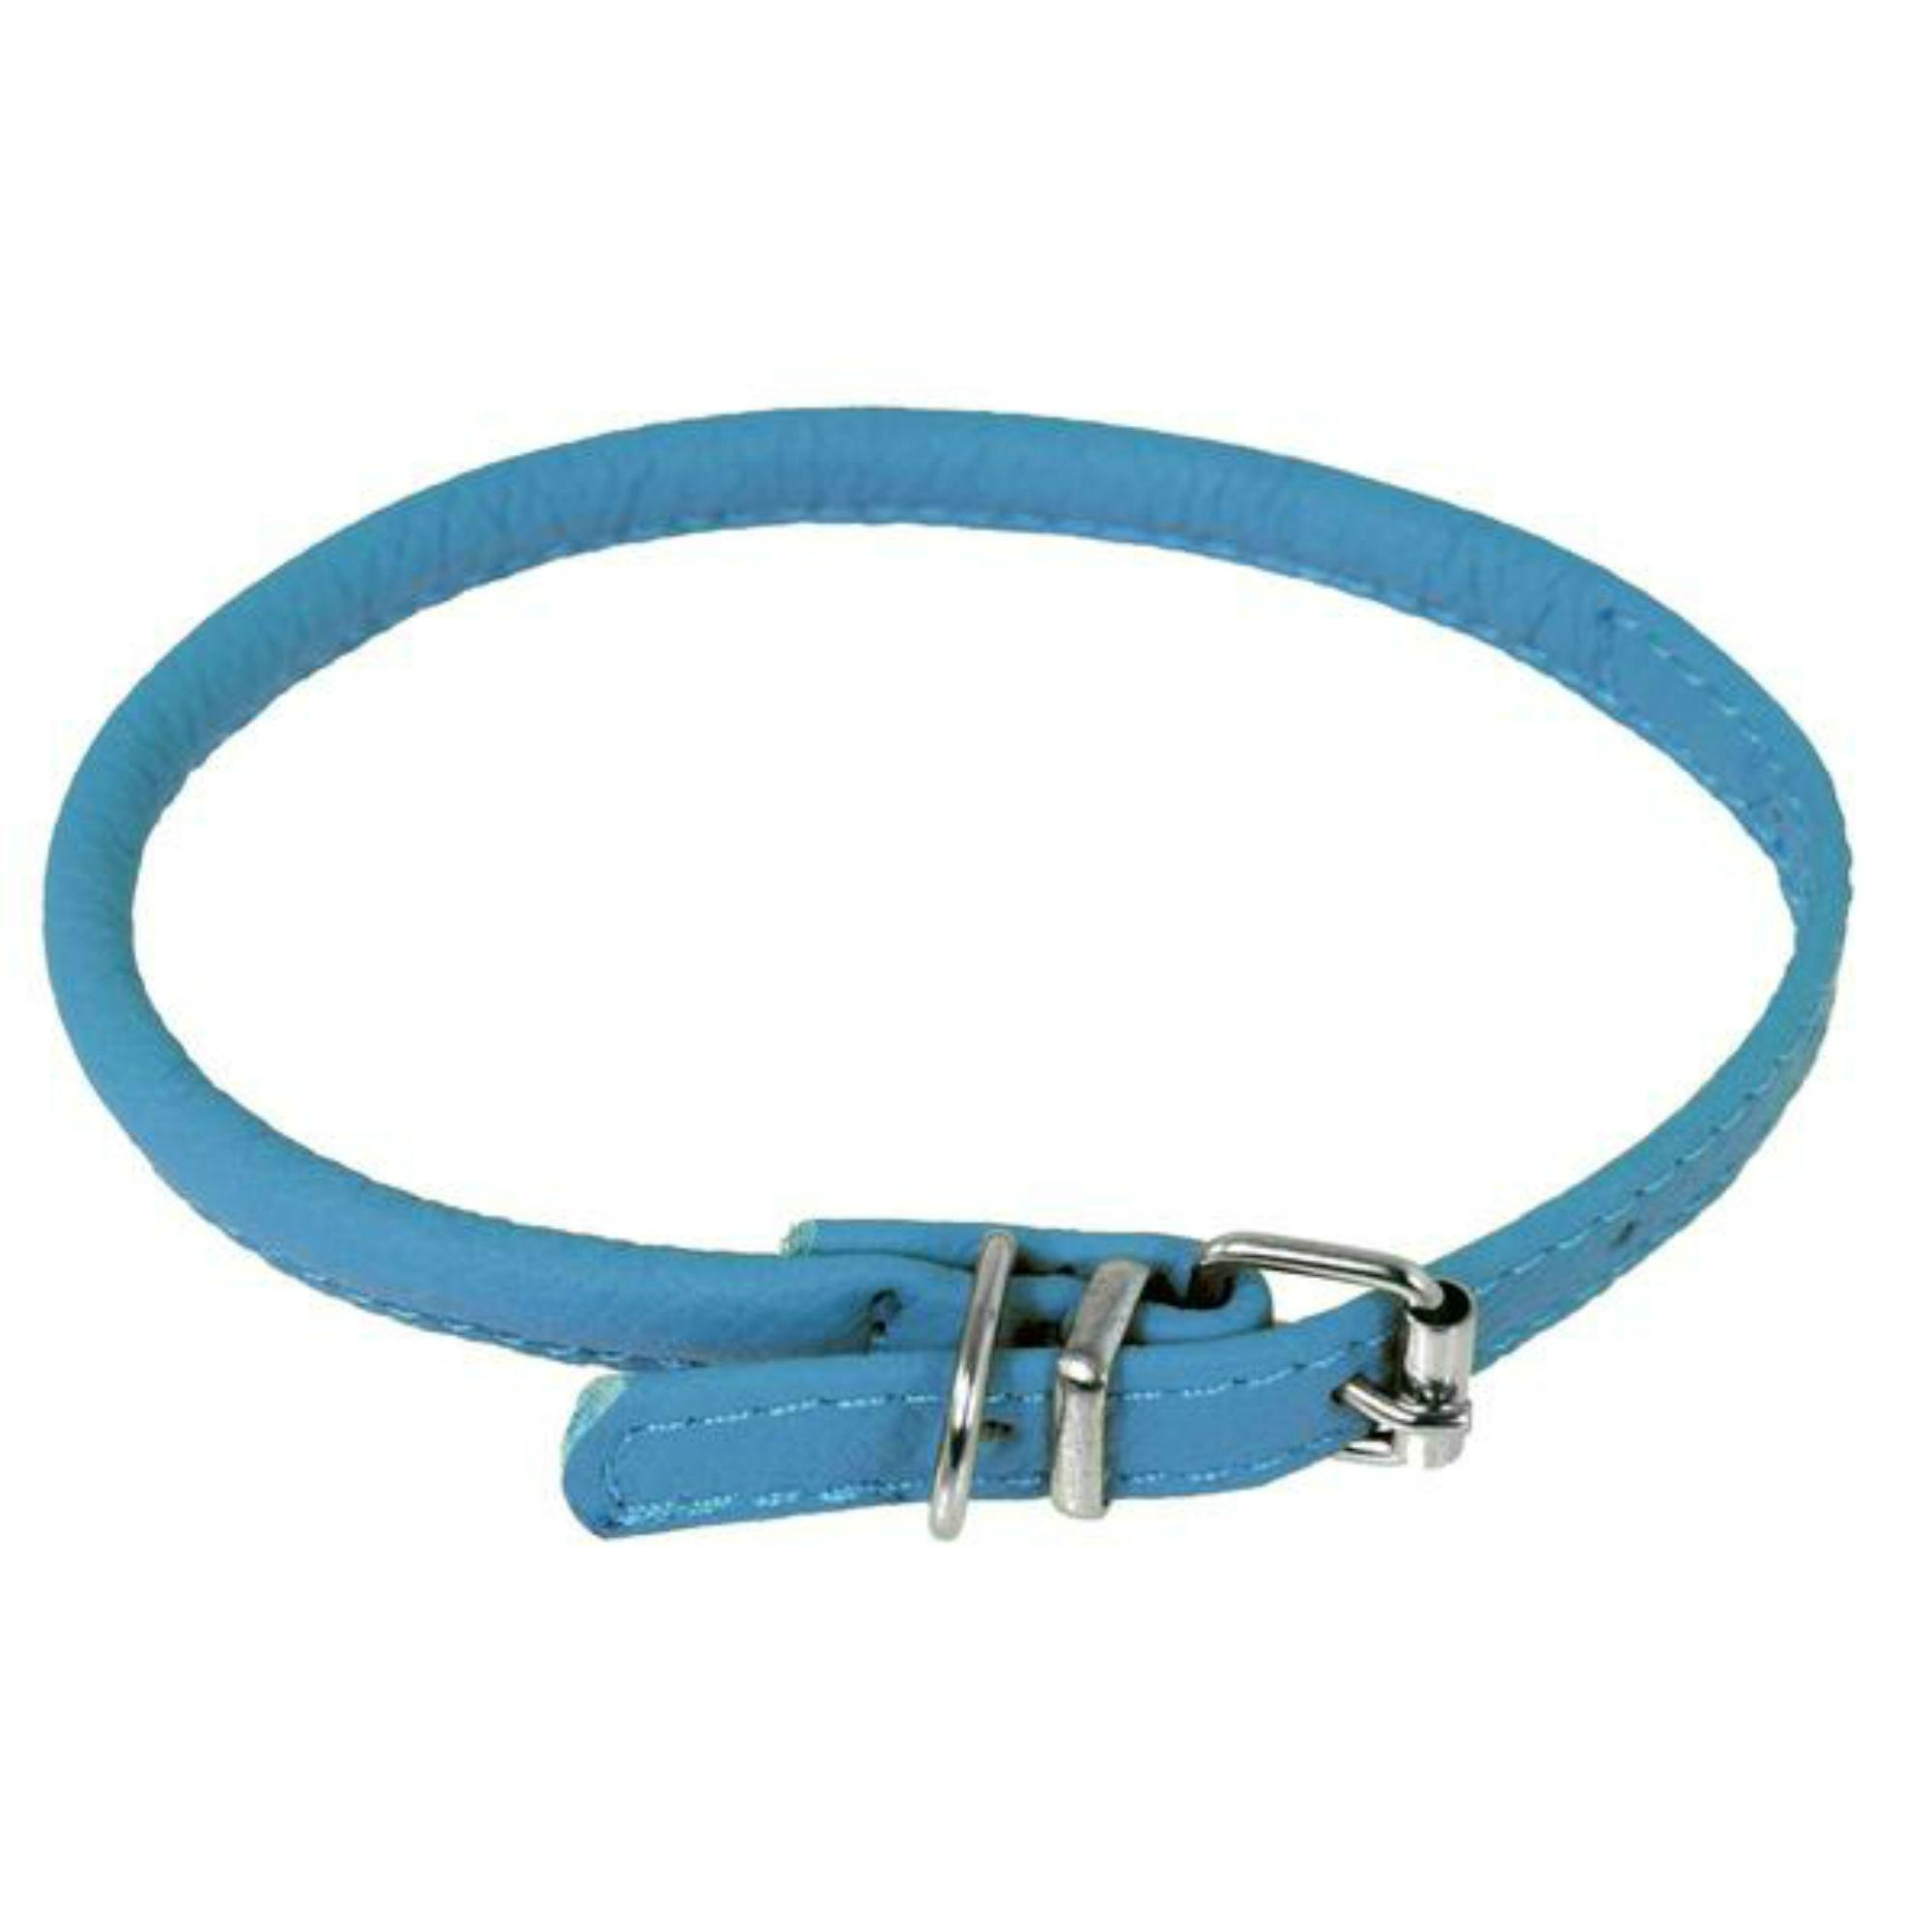 Soft Leather Round Dog Collar - Cyan Blue